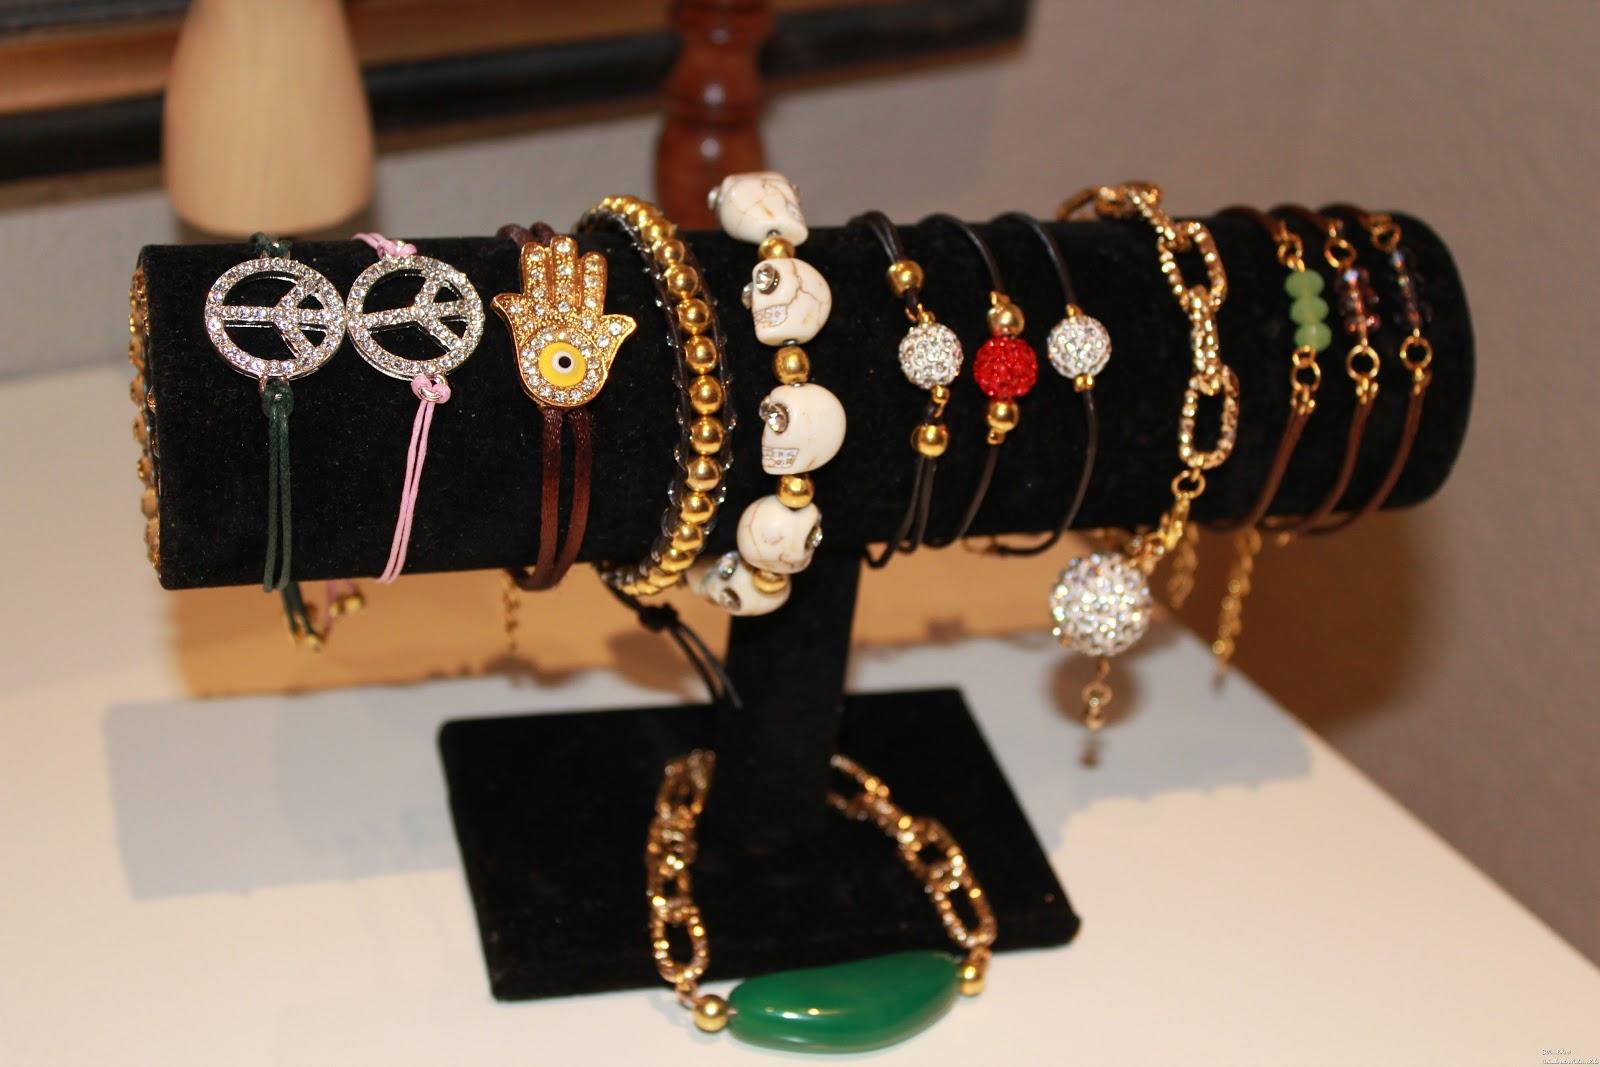 Organizador de pulseras personalizado consultasenlola@hotmail.com